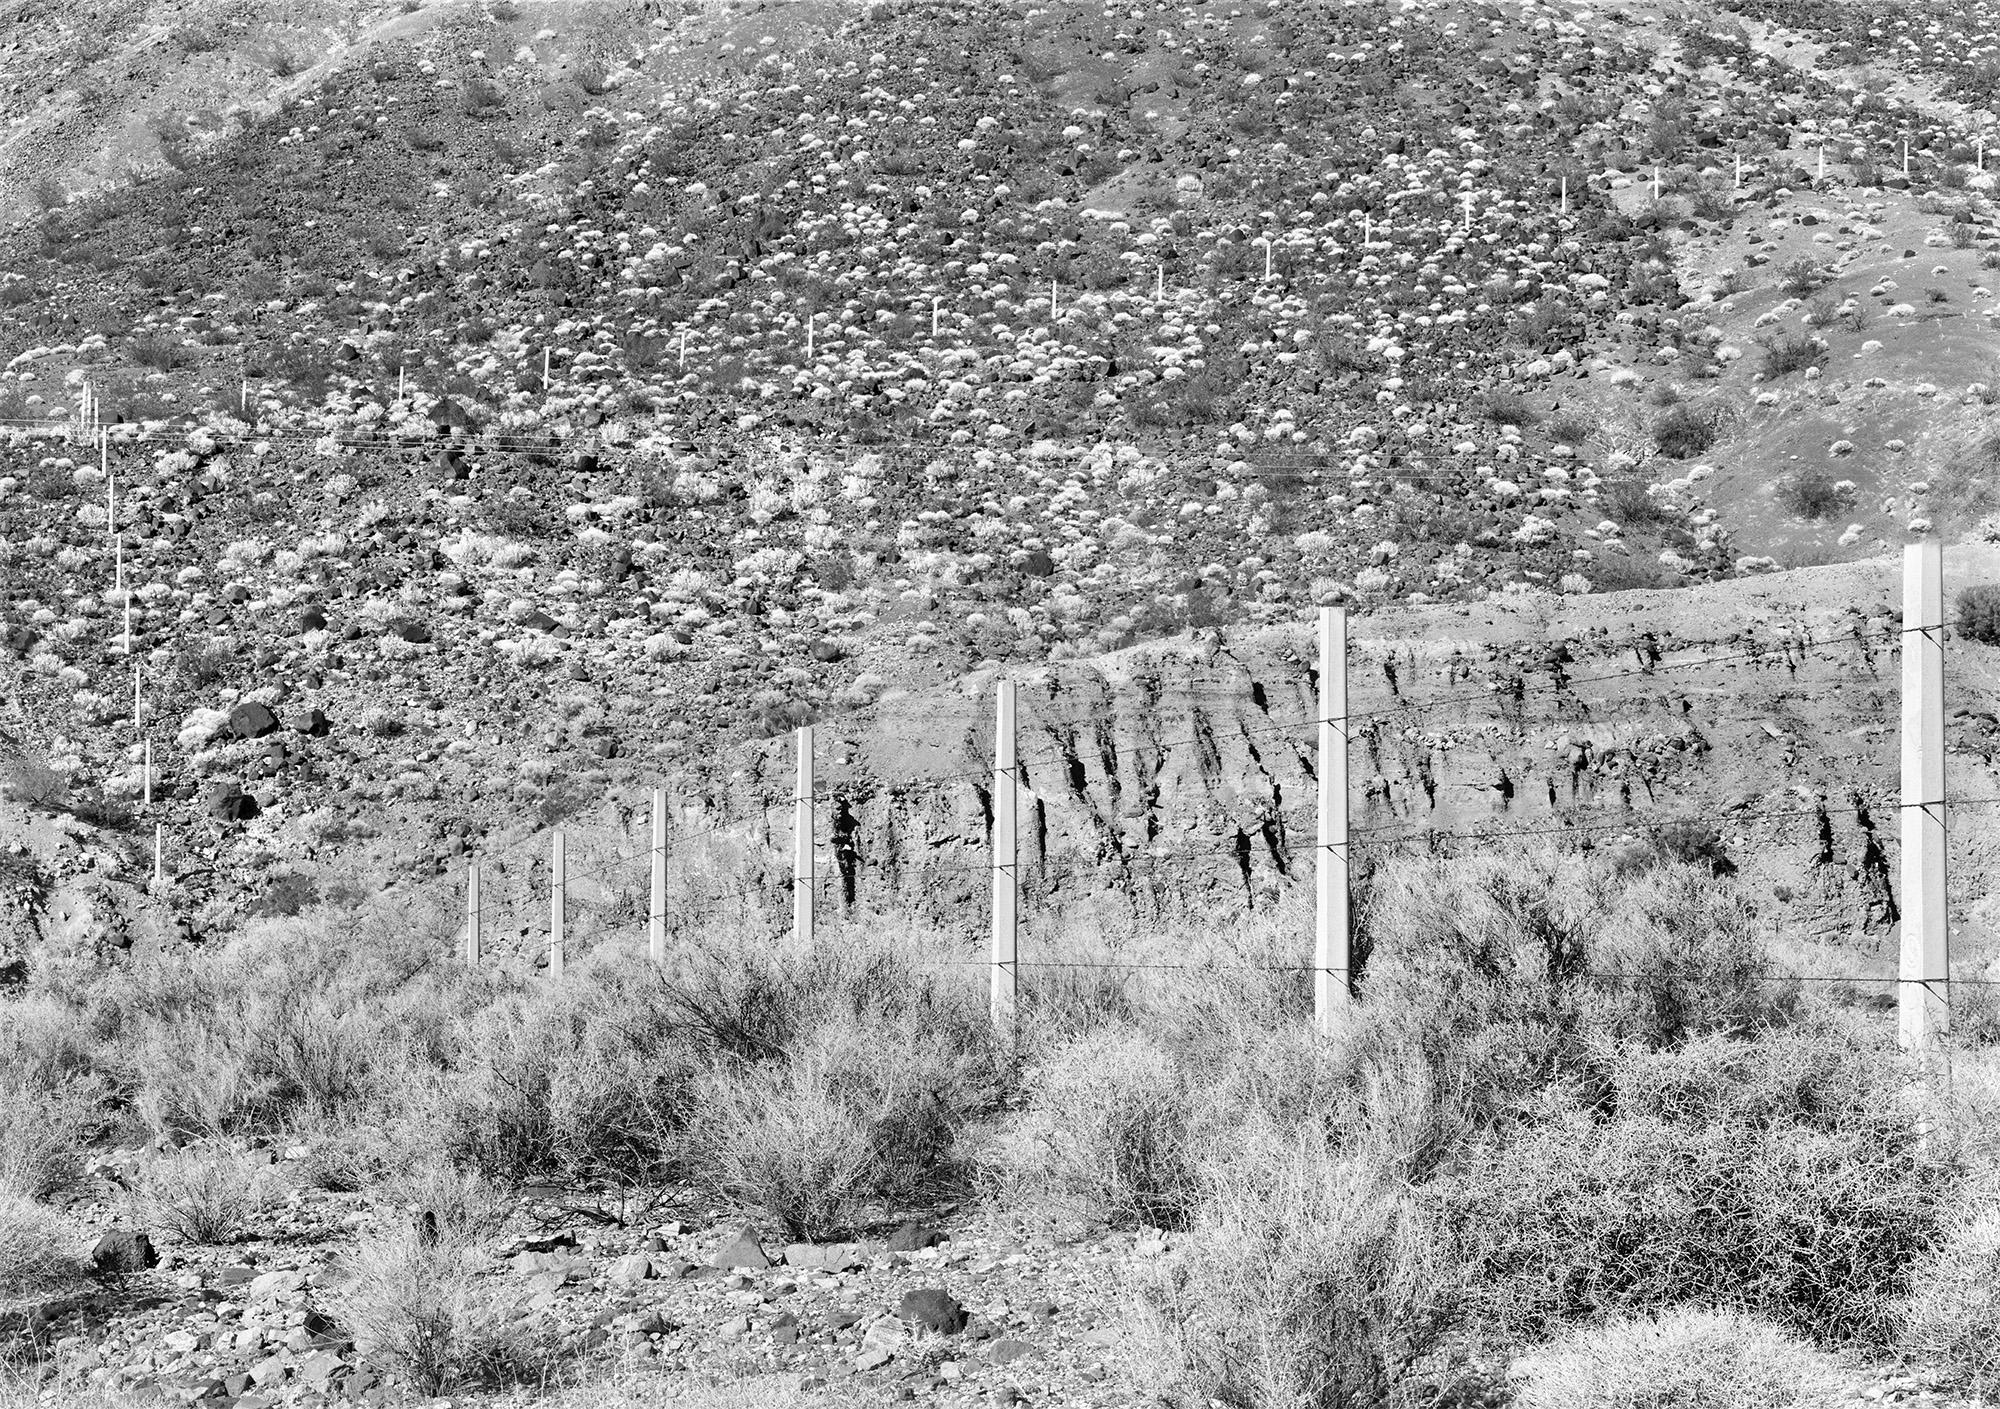 Fence Death Valley, California, USA, 1983